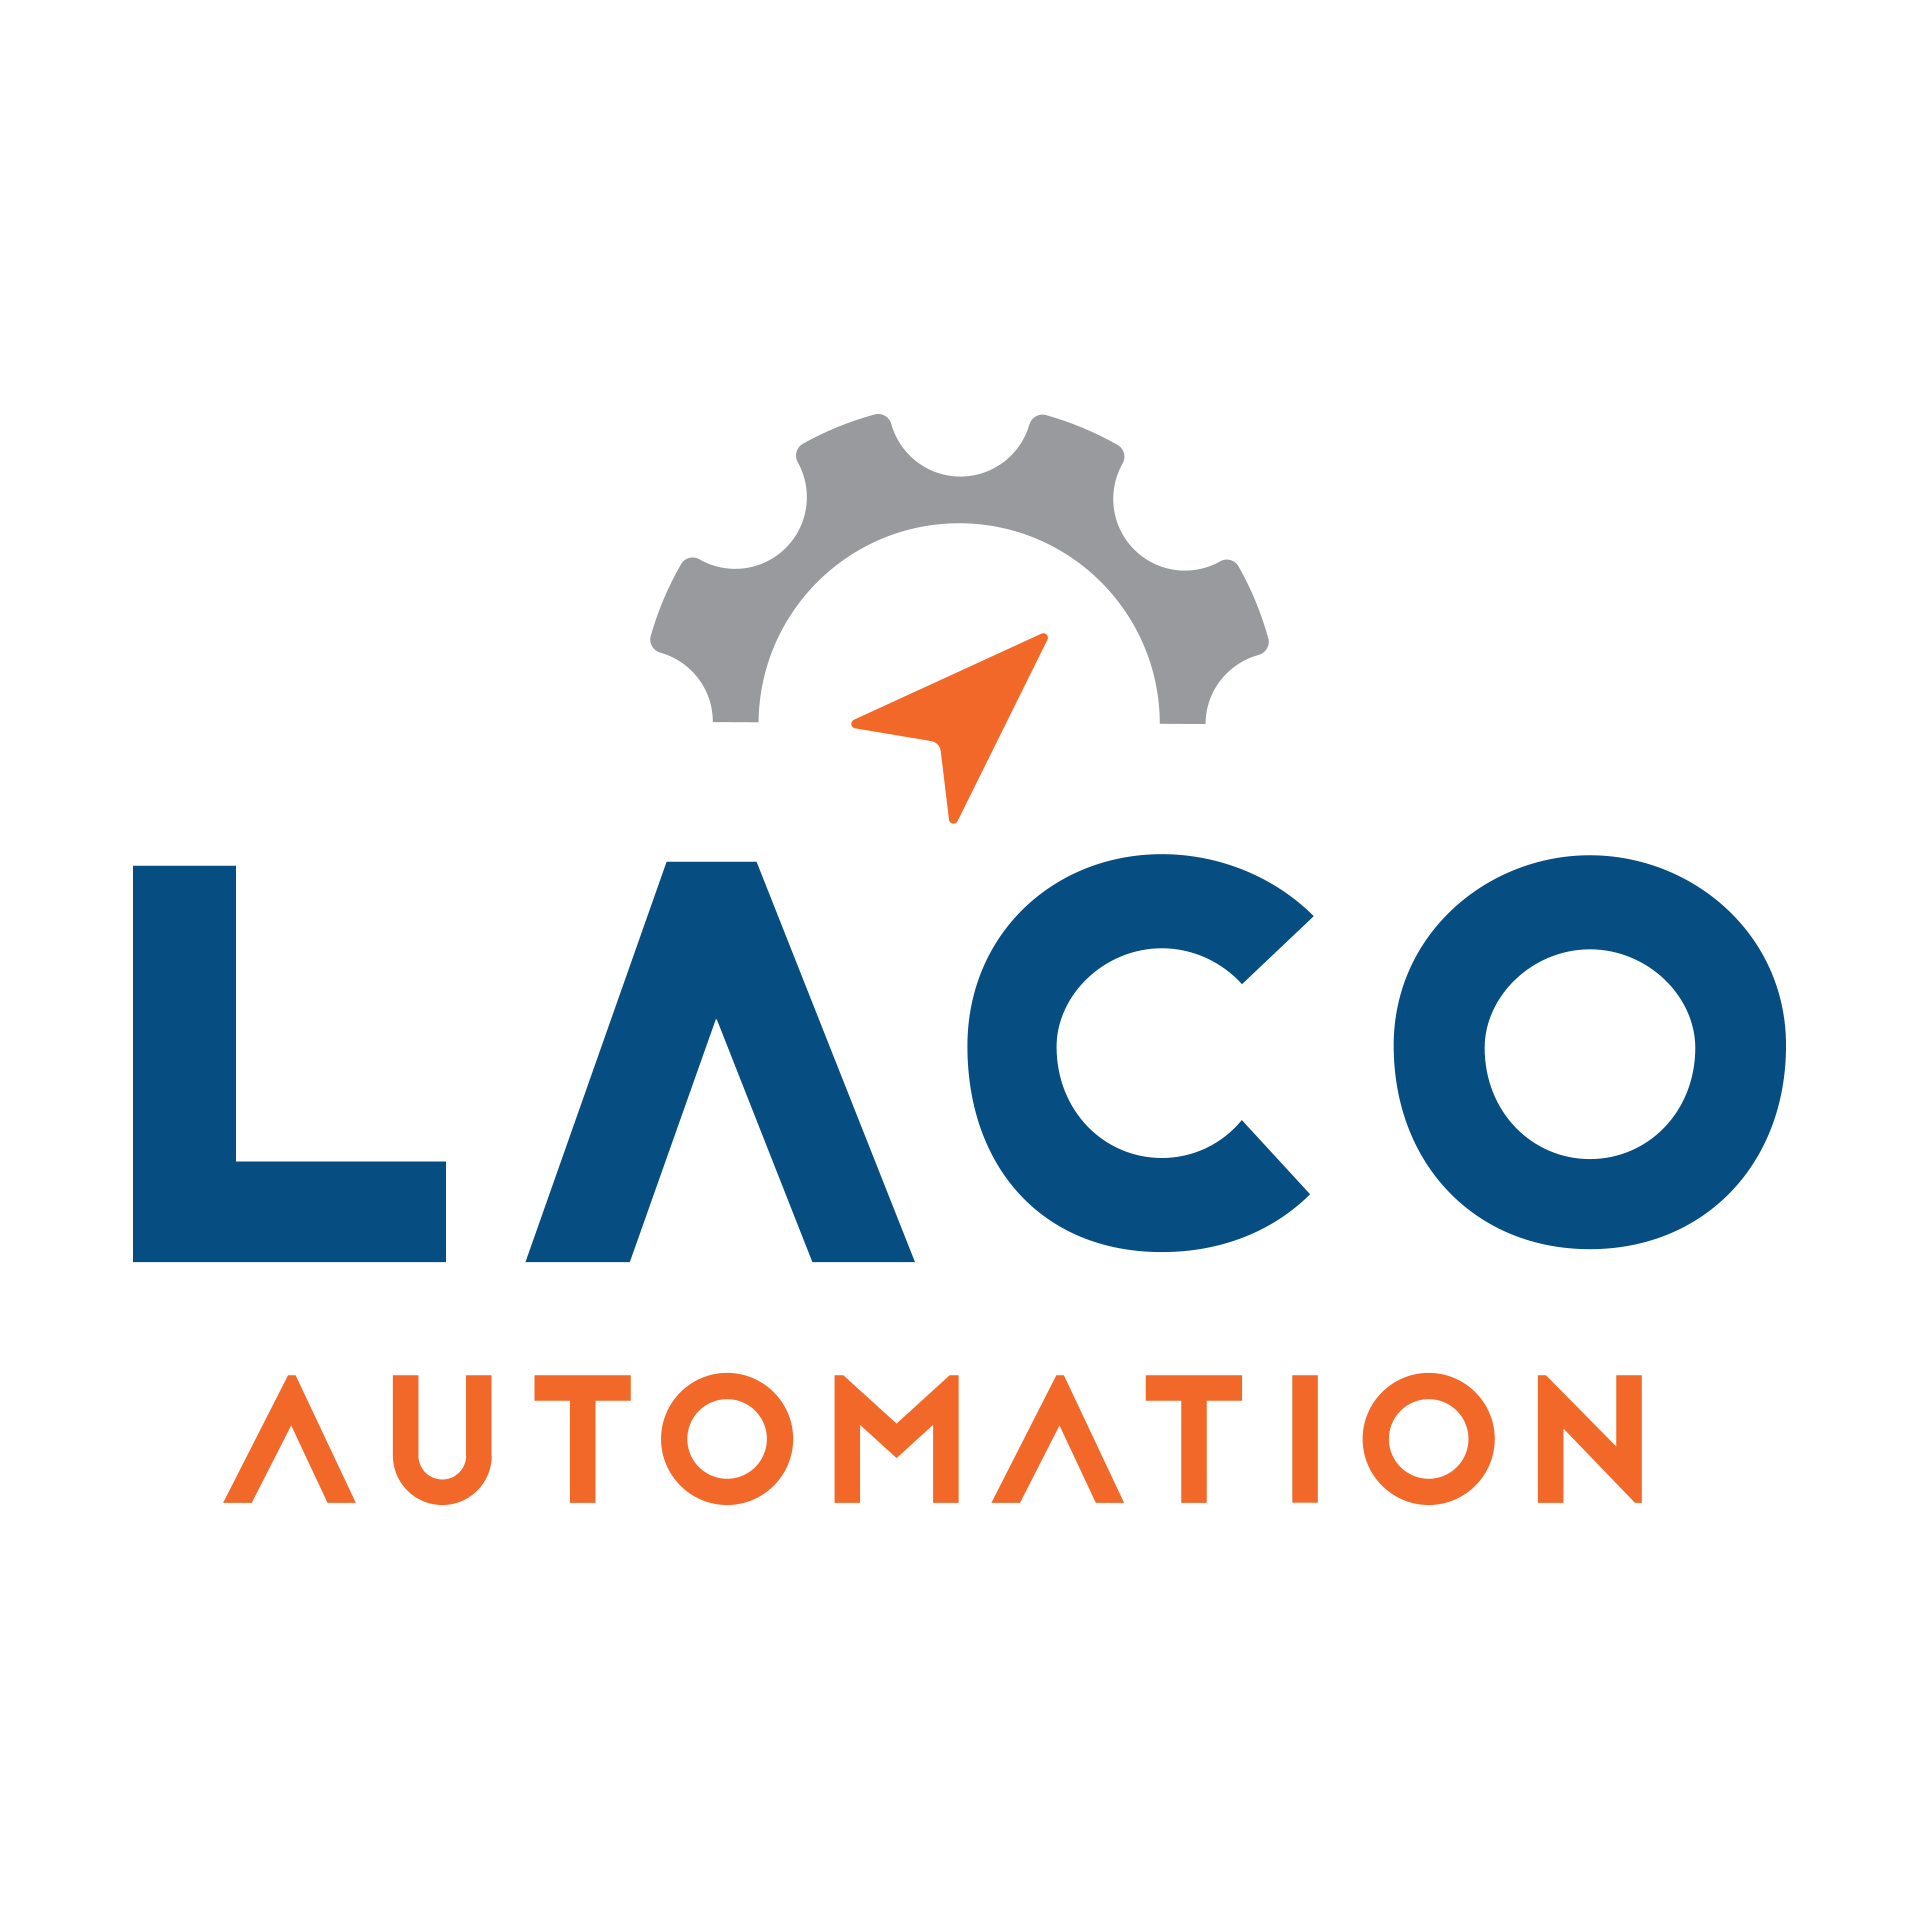 Laco Automation Logo